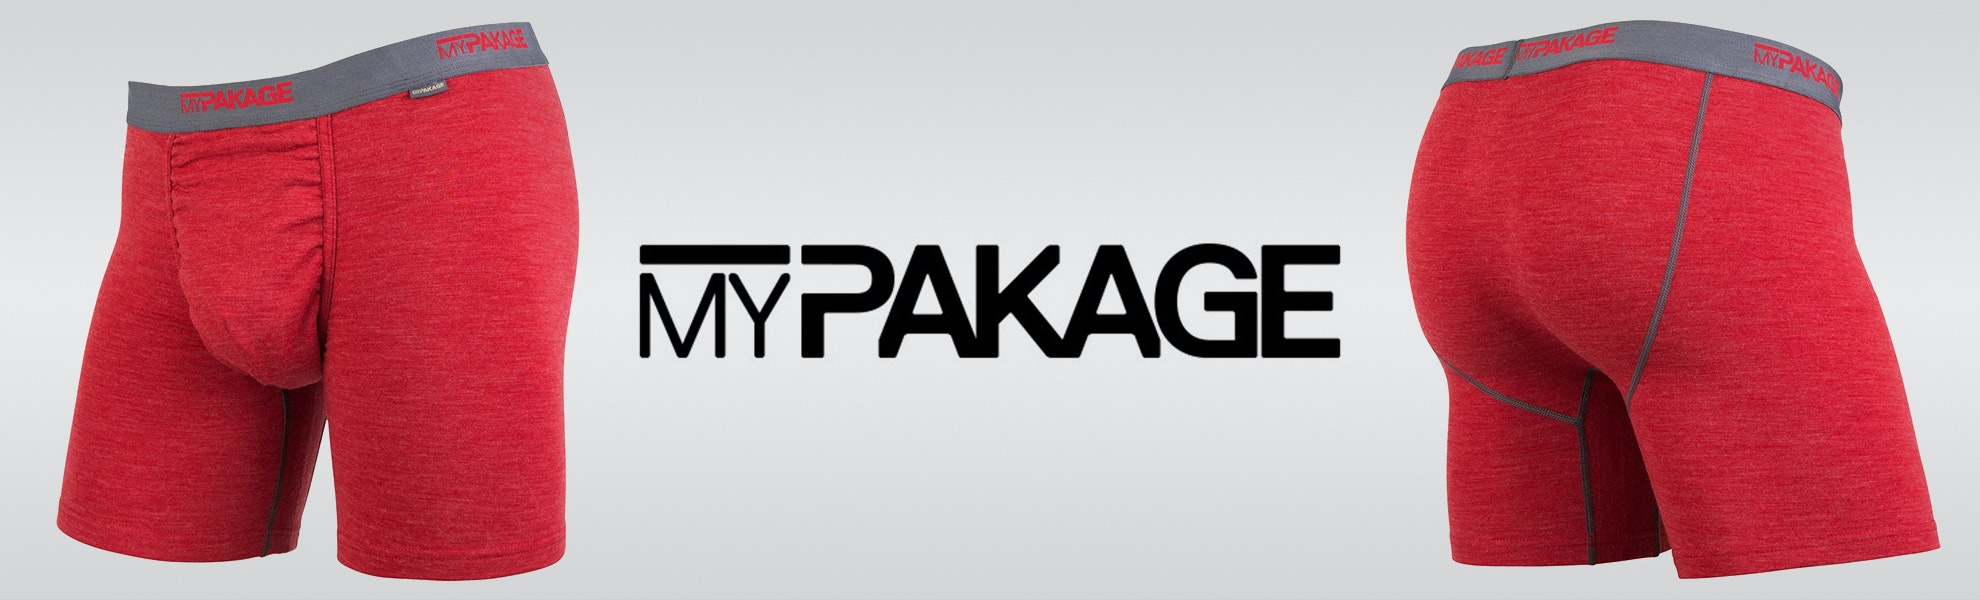 MyPakage Men's Merino Baselayer Closeout